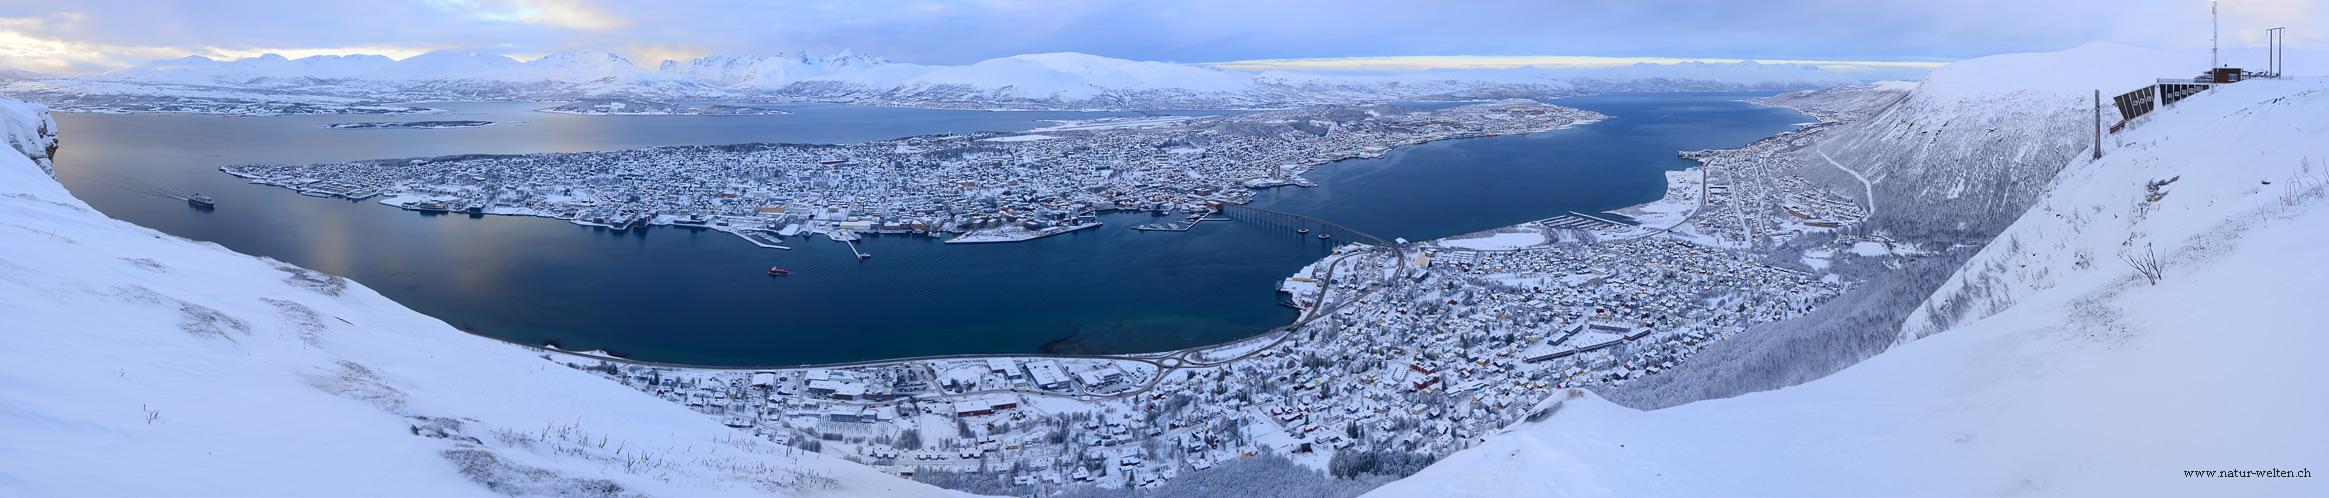 Nordmetropole Tromsö (180° Pano)